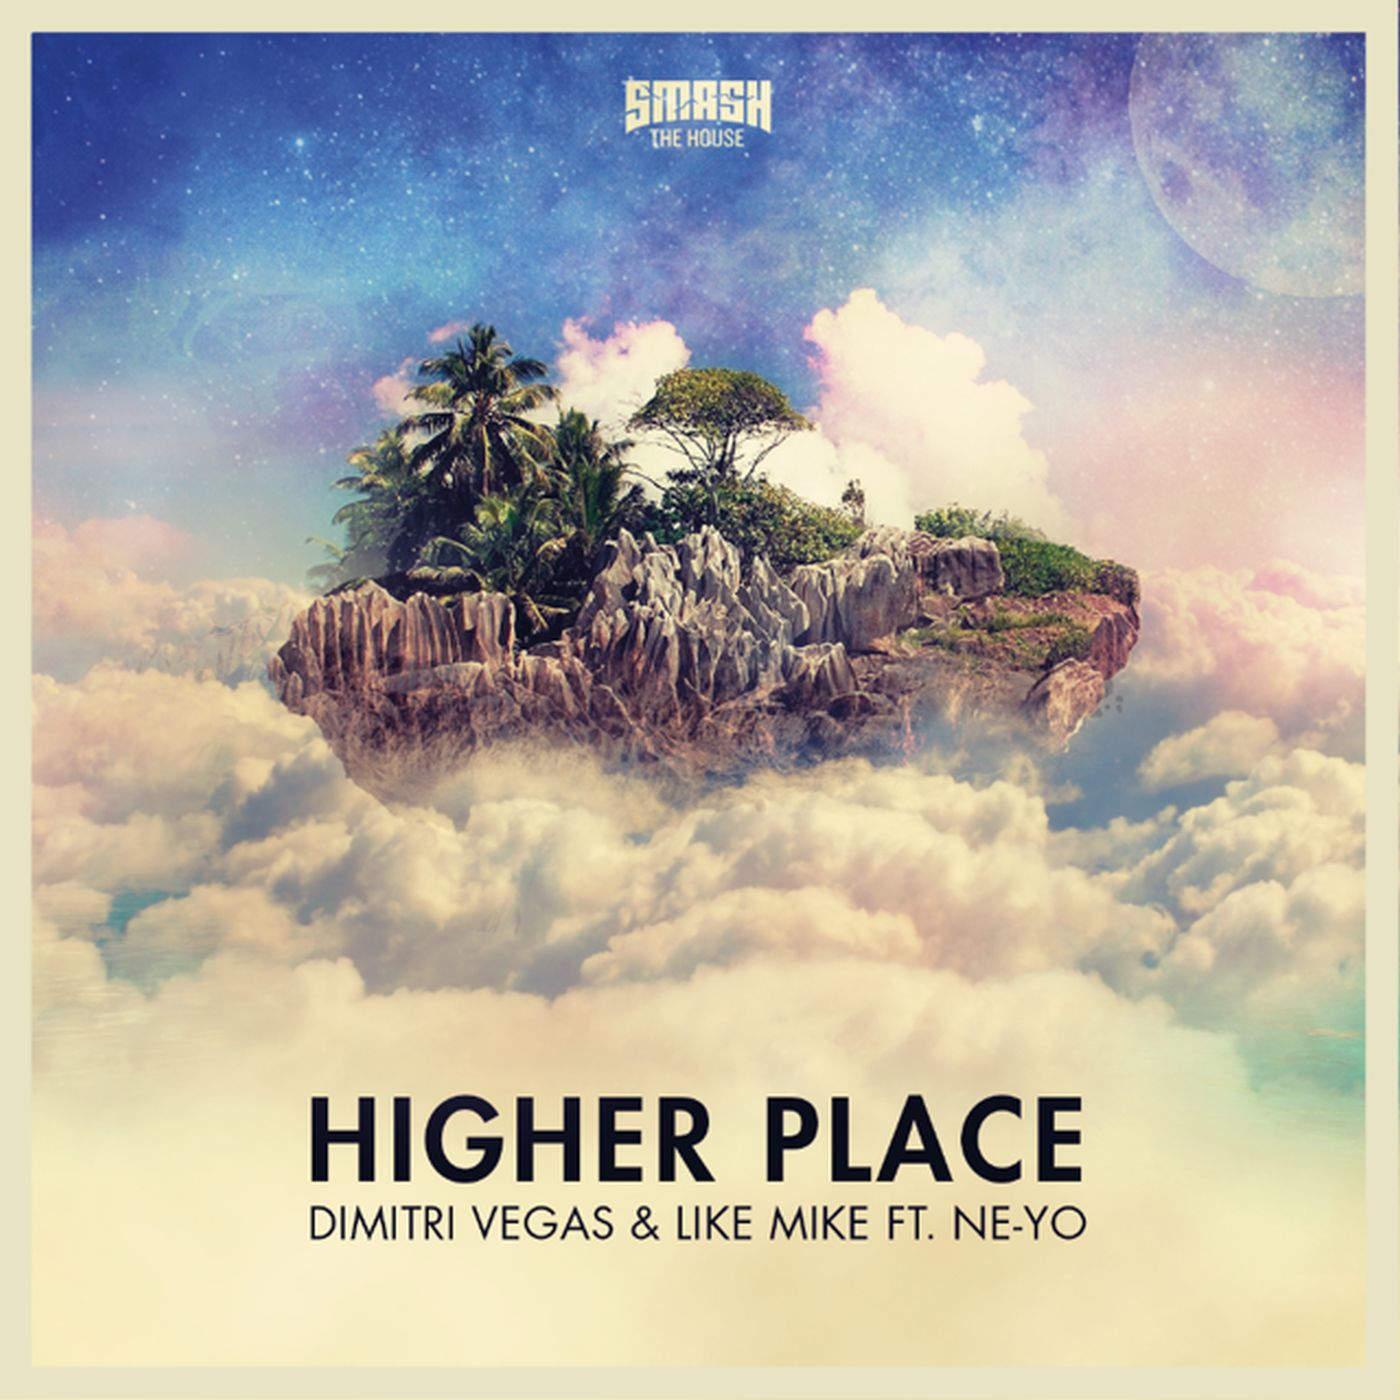 Dimitri Vegas & Like Mike - Higher Place (feat. Ne-Yo) - Single Cover